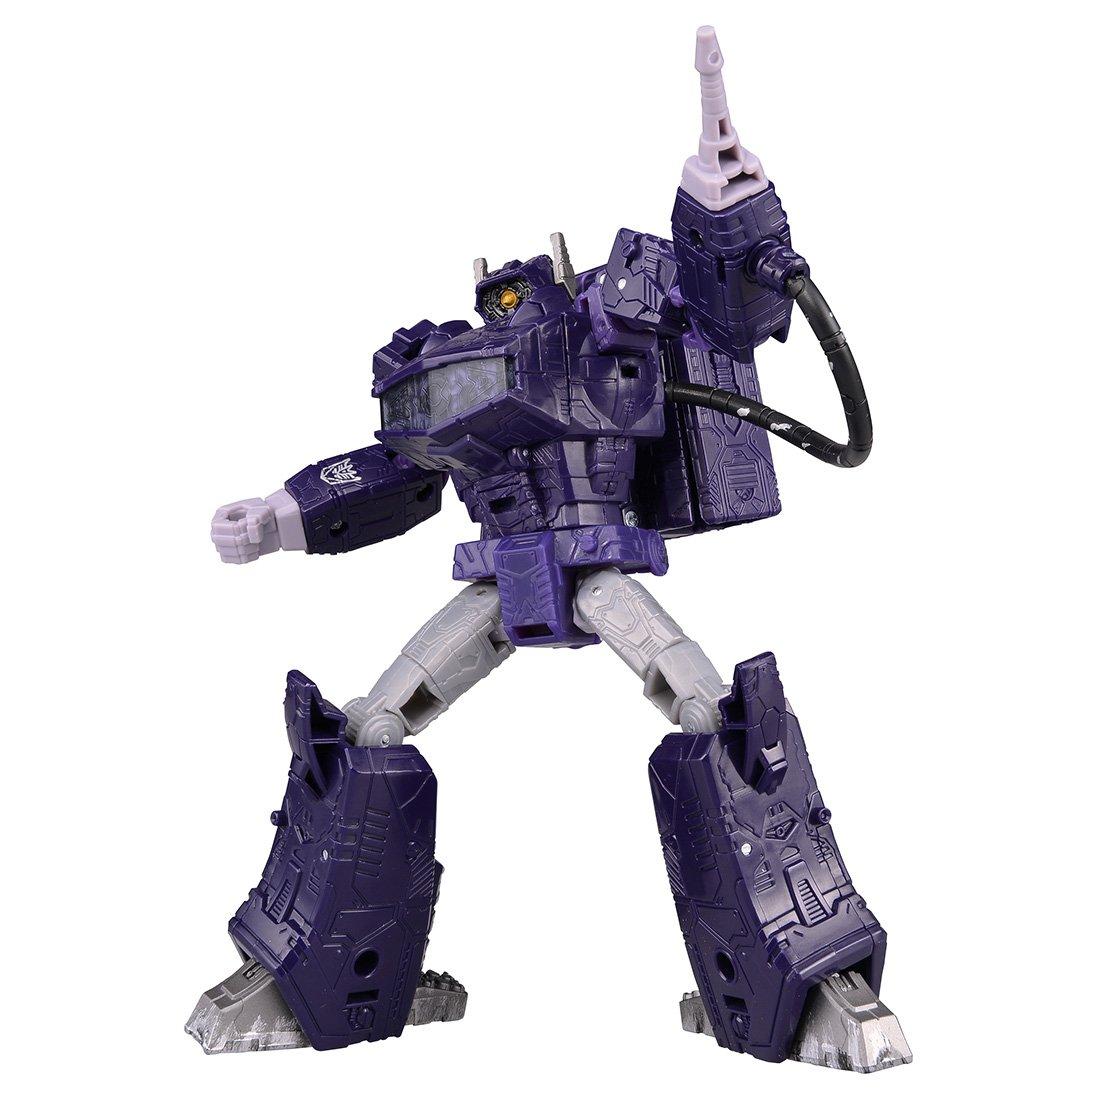 Transformers Siege WFC-S14 Decepticon Shockwave - Leader